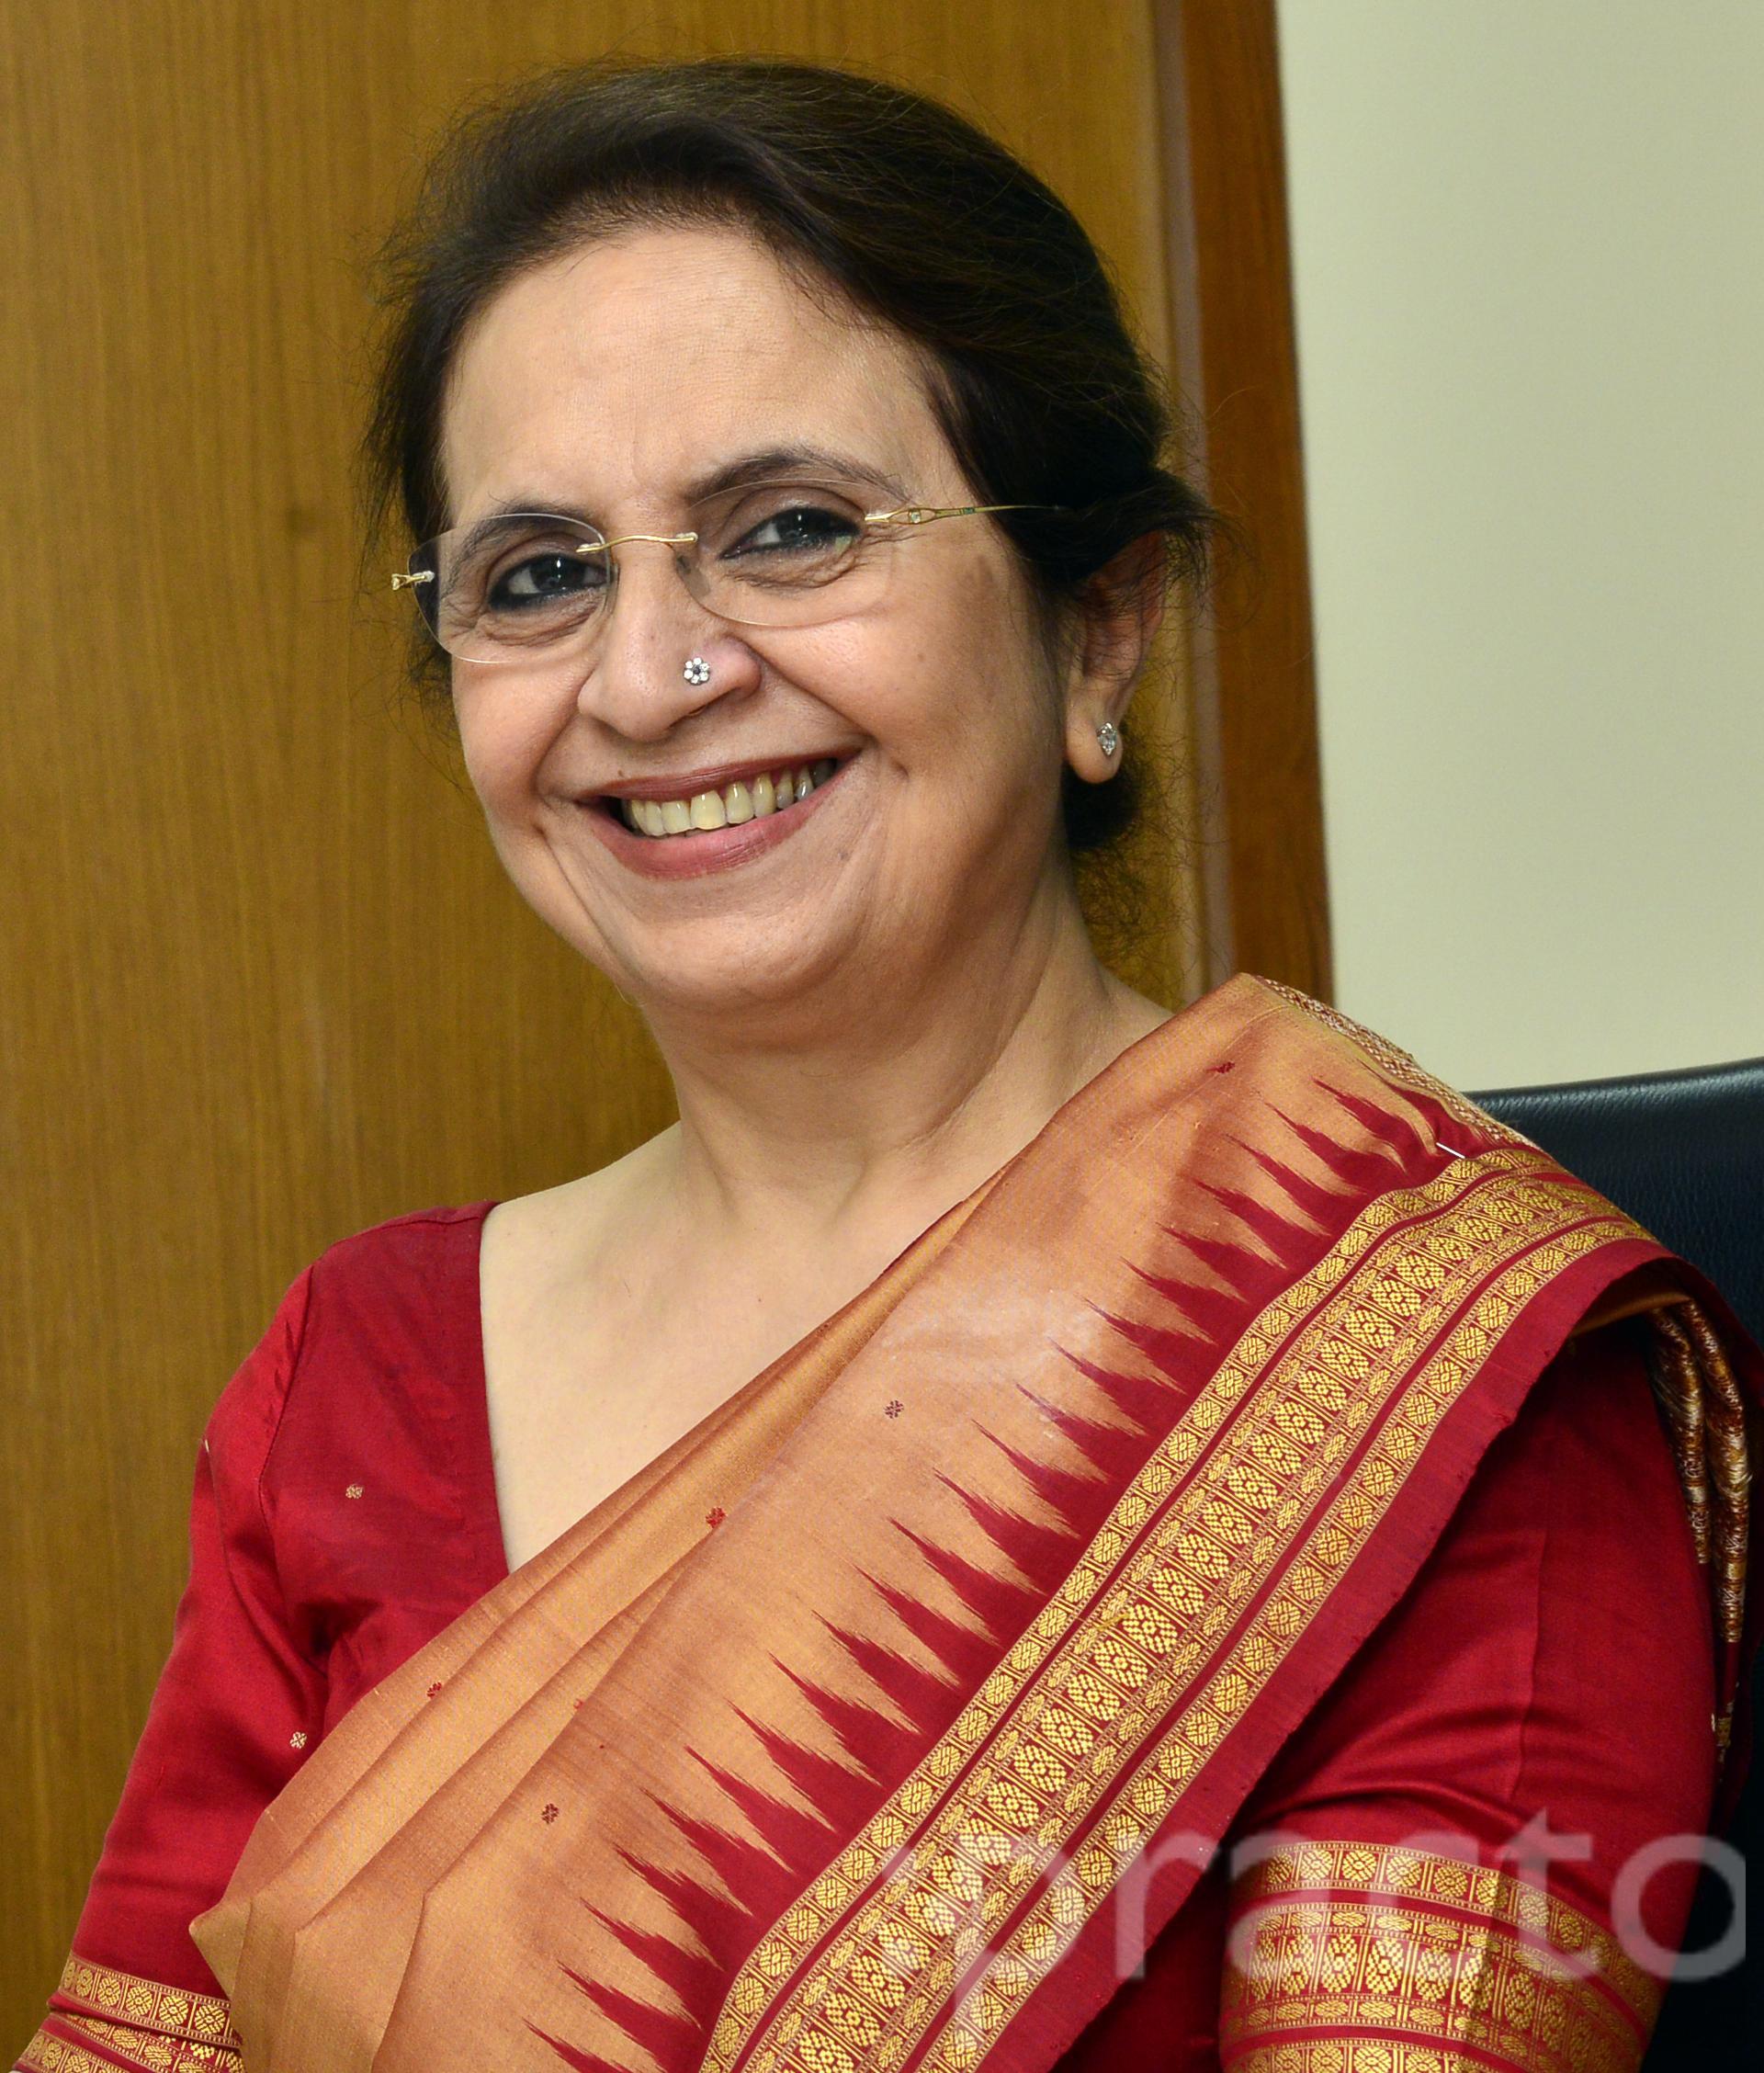 Dr. Malvika Sabharwal - Gynecologist/Obstetrician